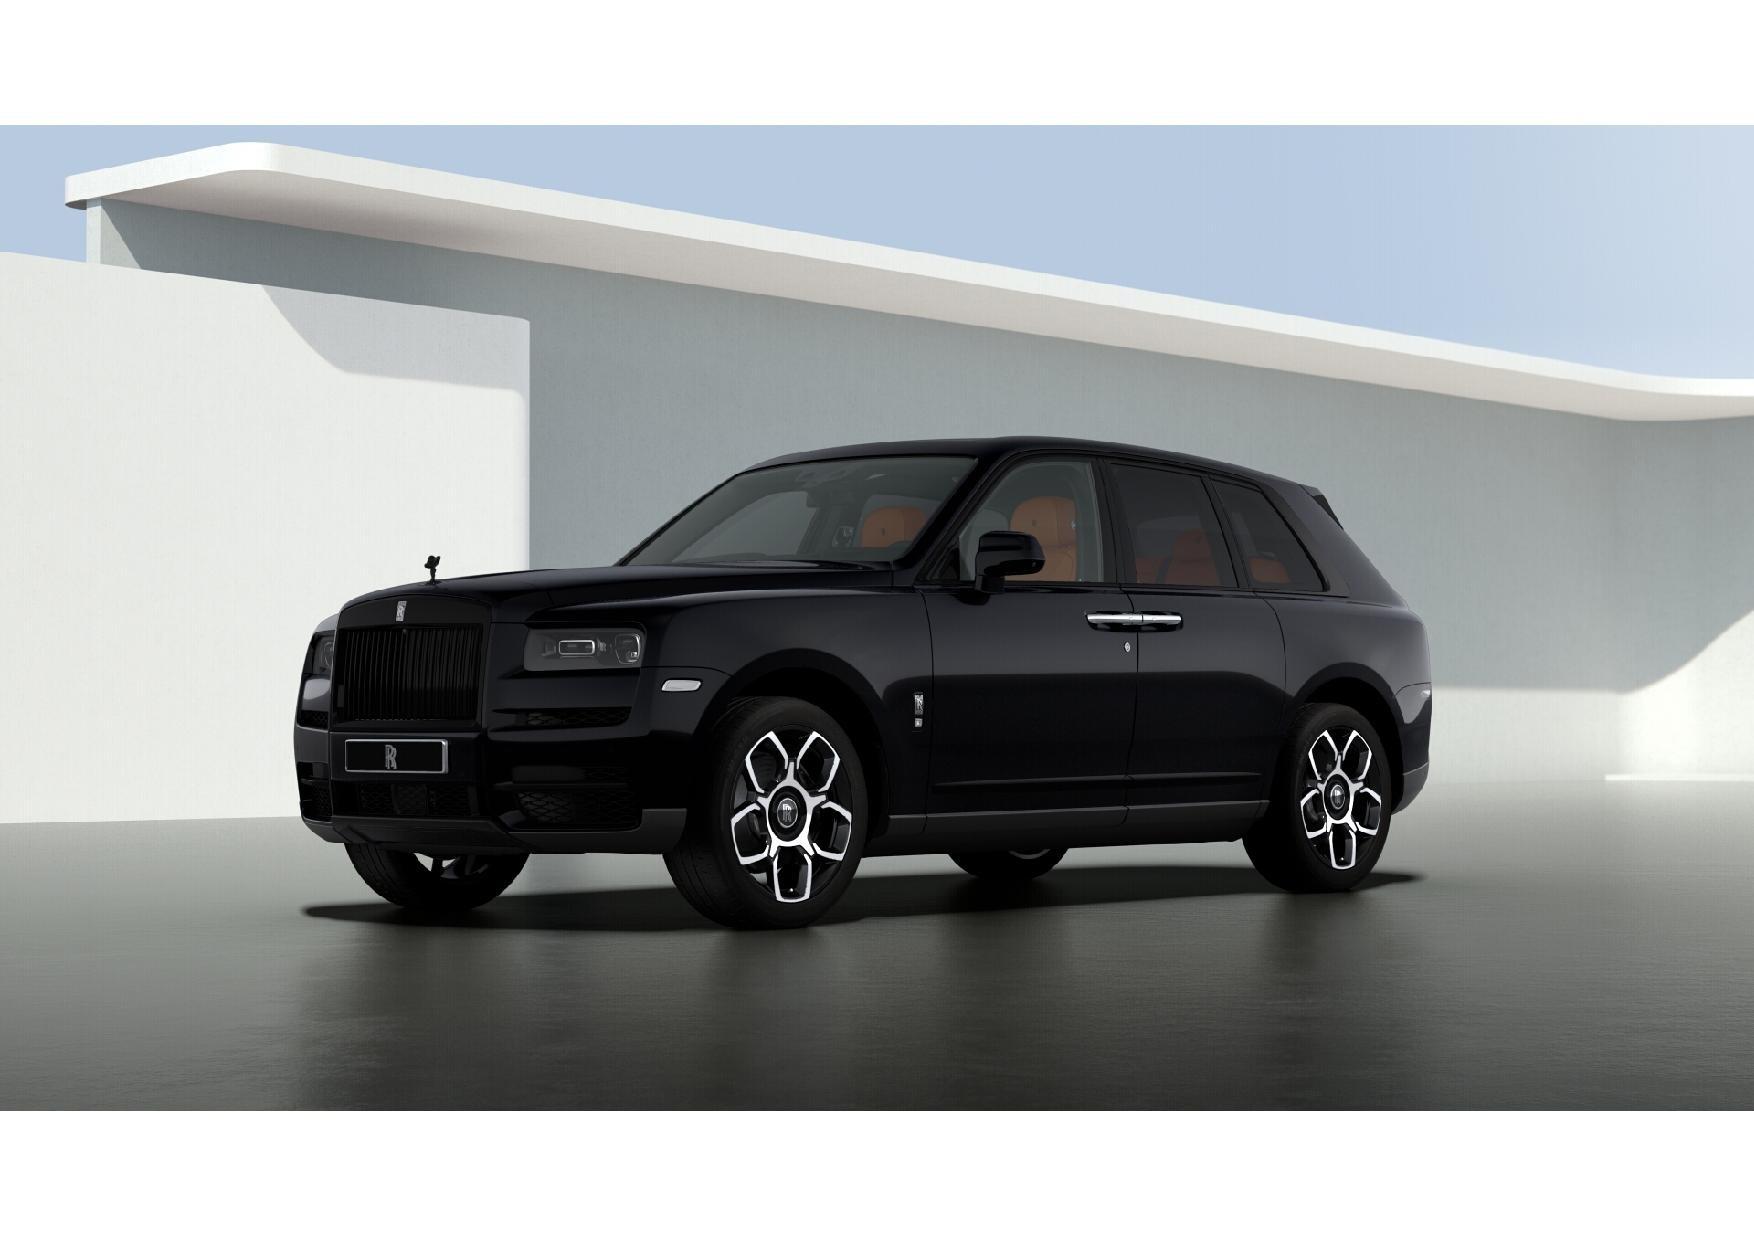 New 2021 Rolls-Royce Cullinan Black Badge for sale $433,225 at Alfa Romeo of Westport in Westport CT 06880 1